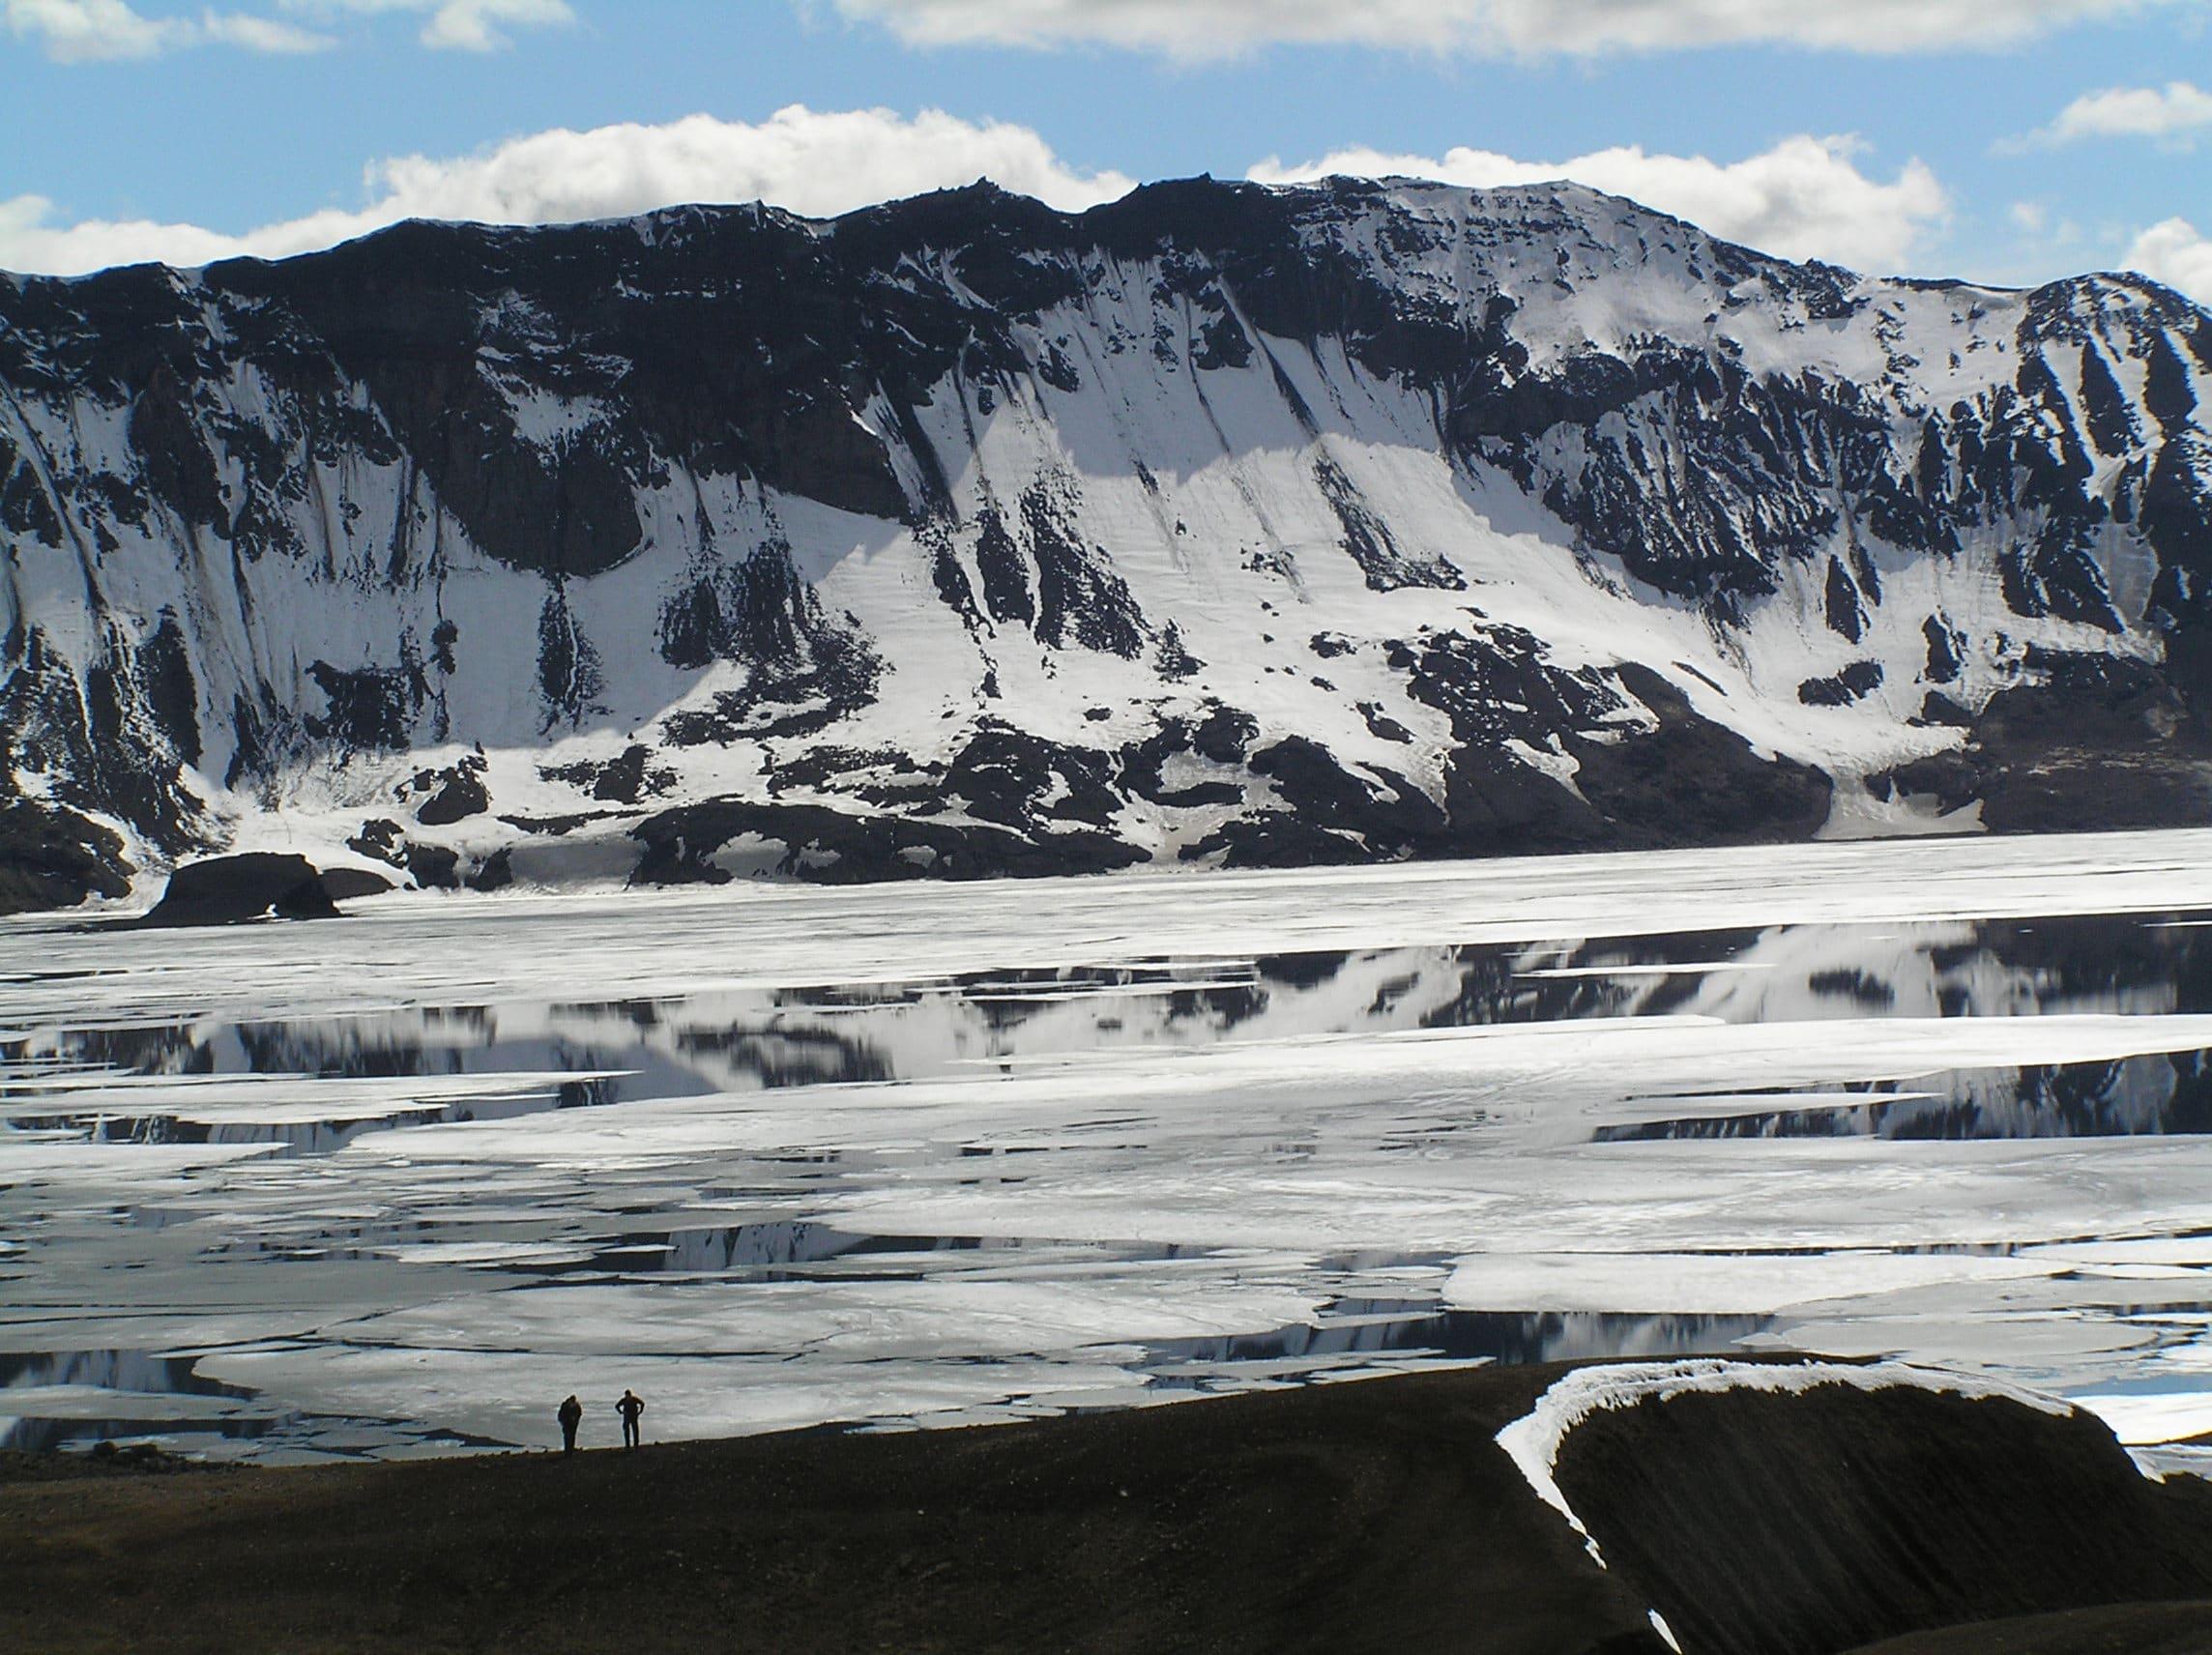 Askja caldera and Askja lake